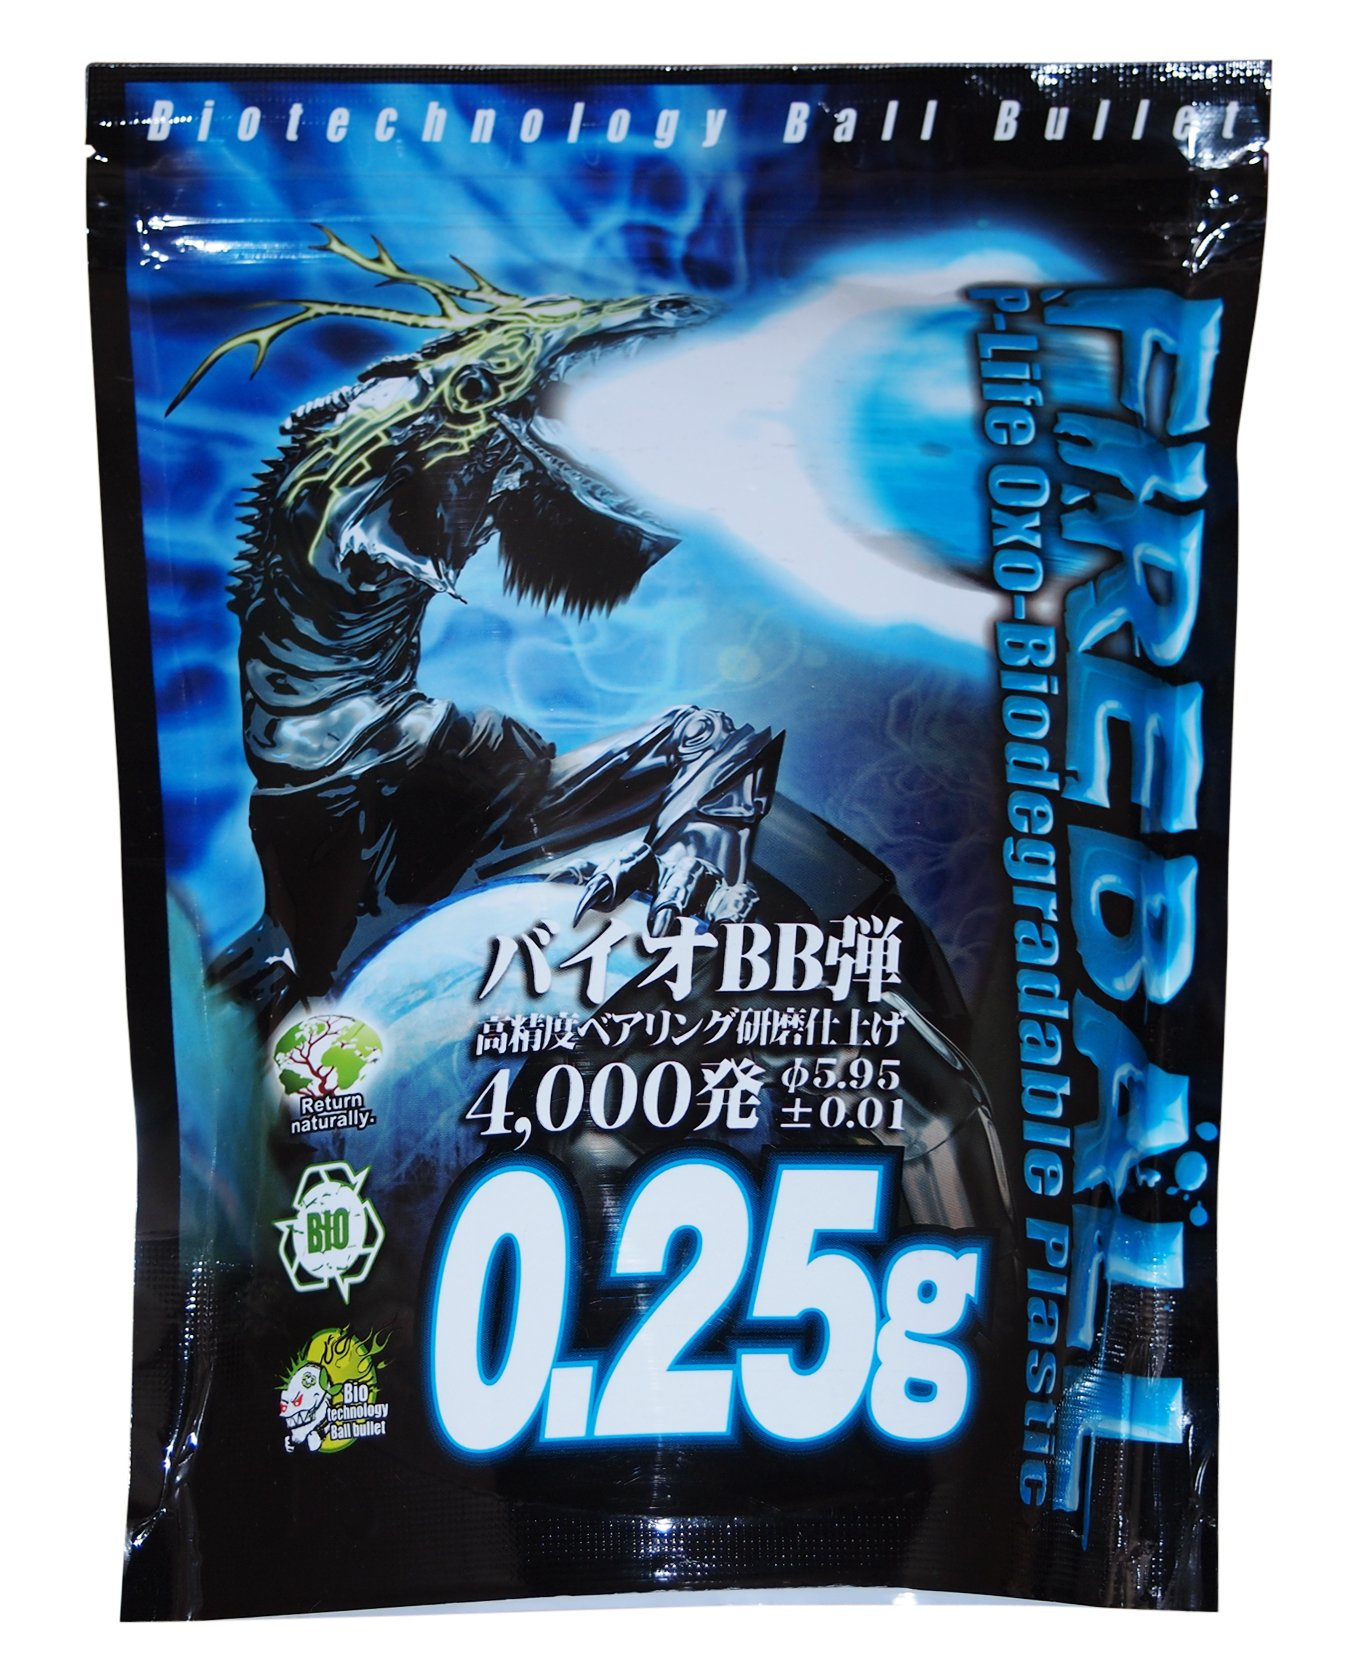 Bio BB bullet 0.25g 4000 Fireball shots oxidized form biodegradable plastic (japan import)